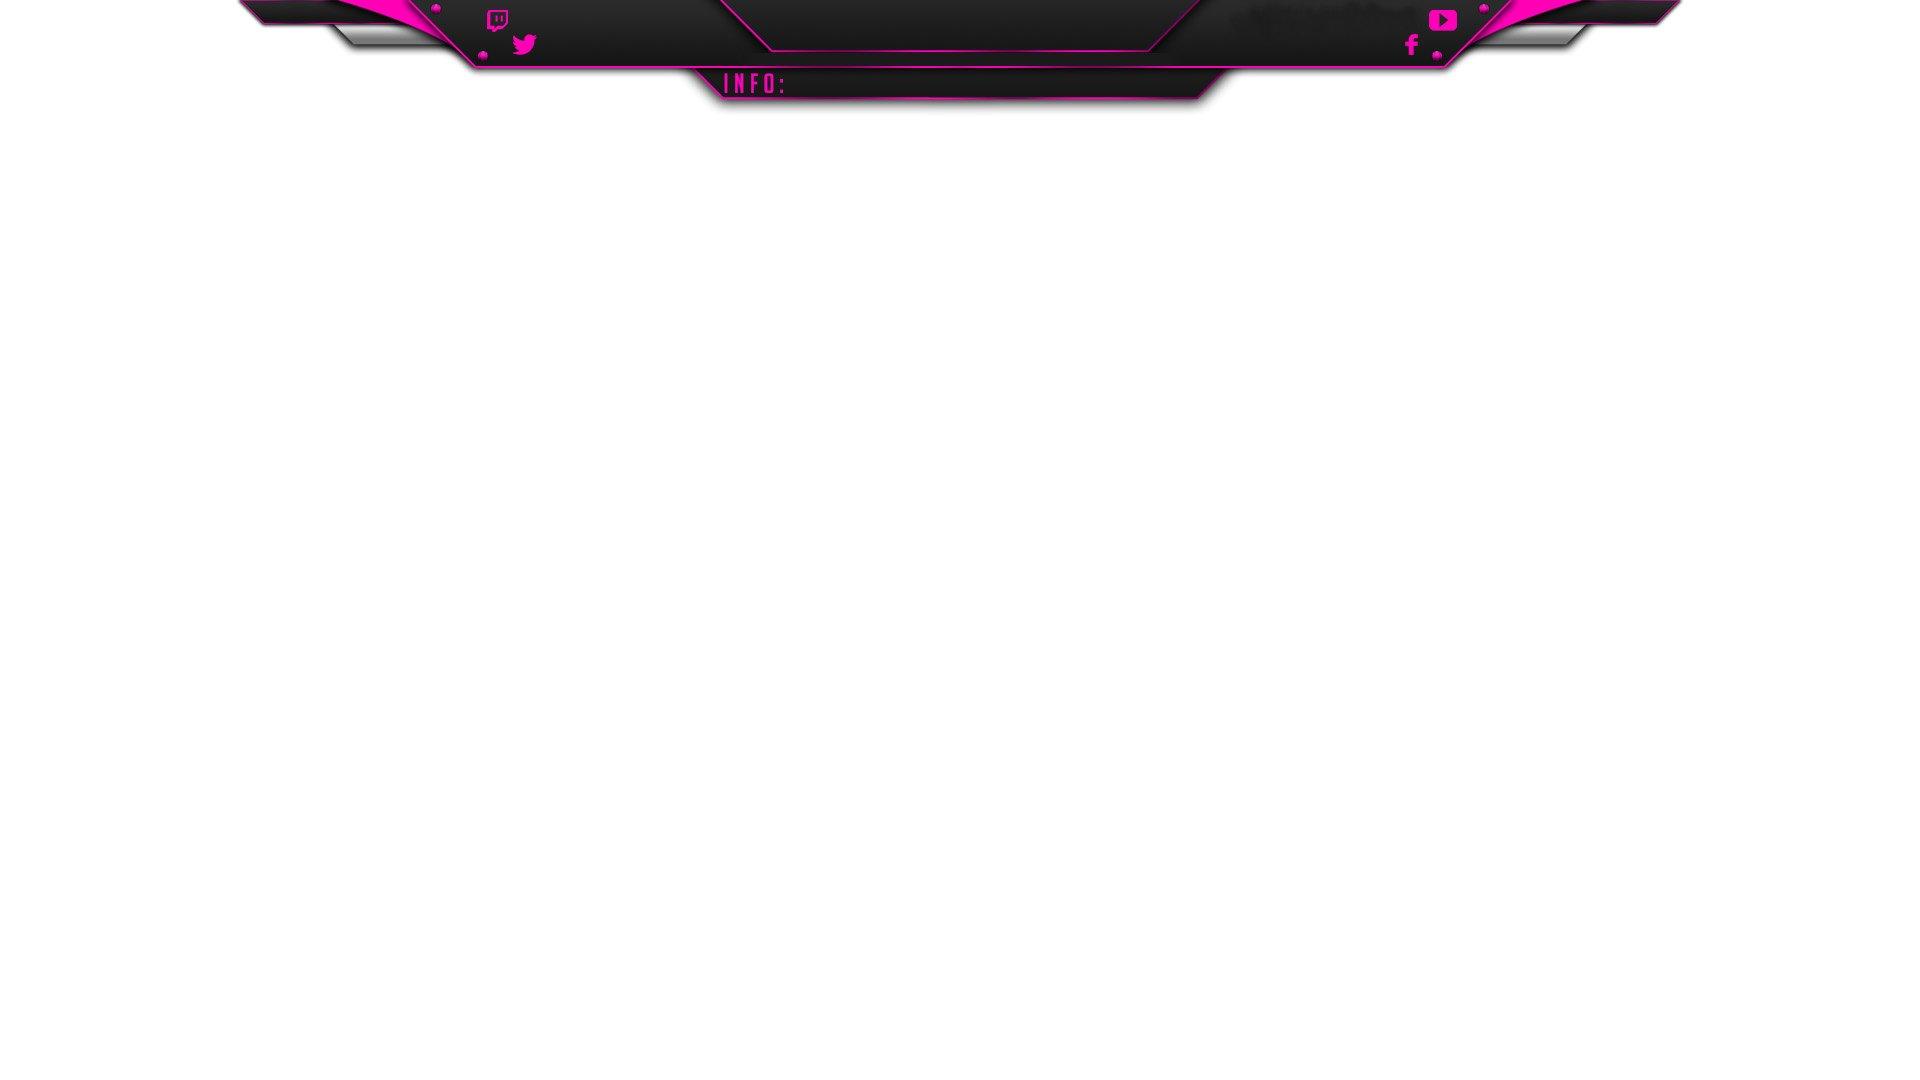 Faze twitch overlay streamlays template overlay hitbox free maxwellsz